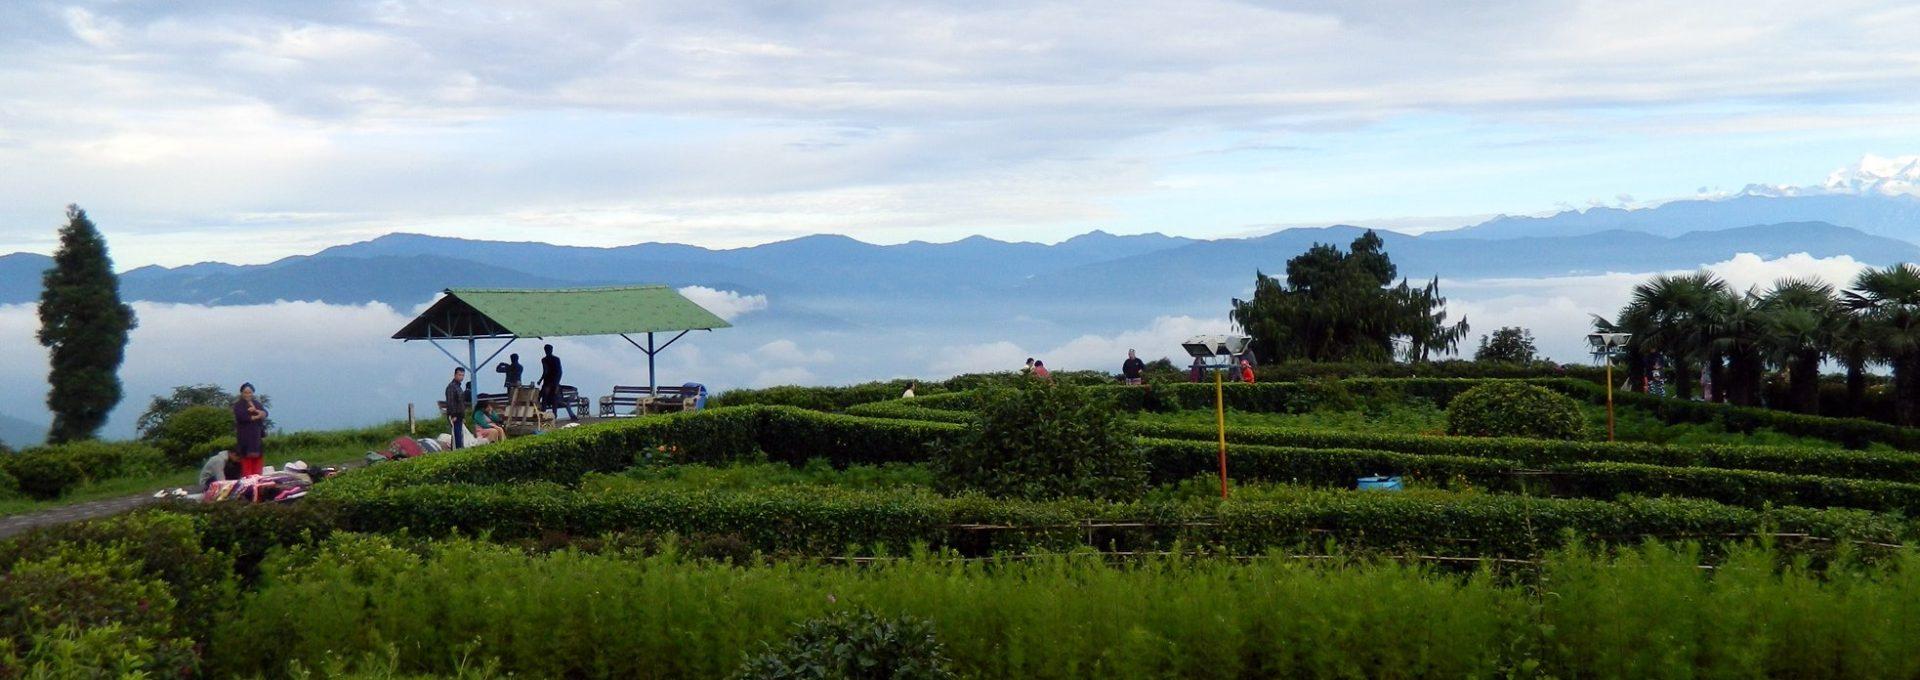 Gurusambhava Tours & Treks   Kalimpong, West Bengal, India